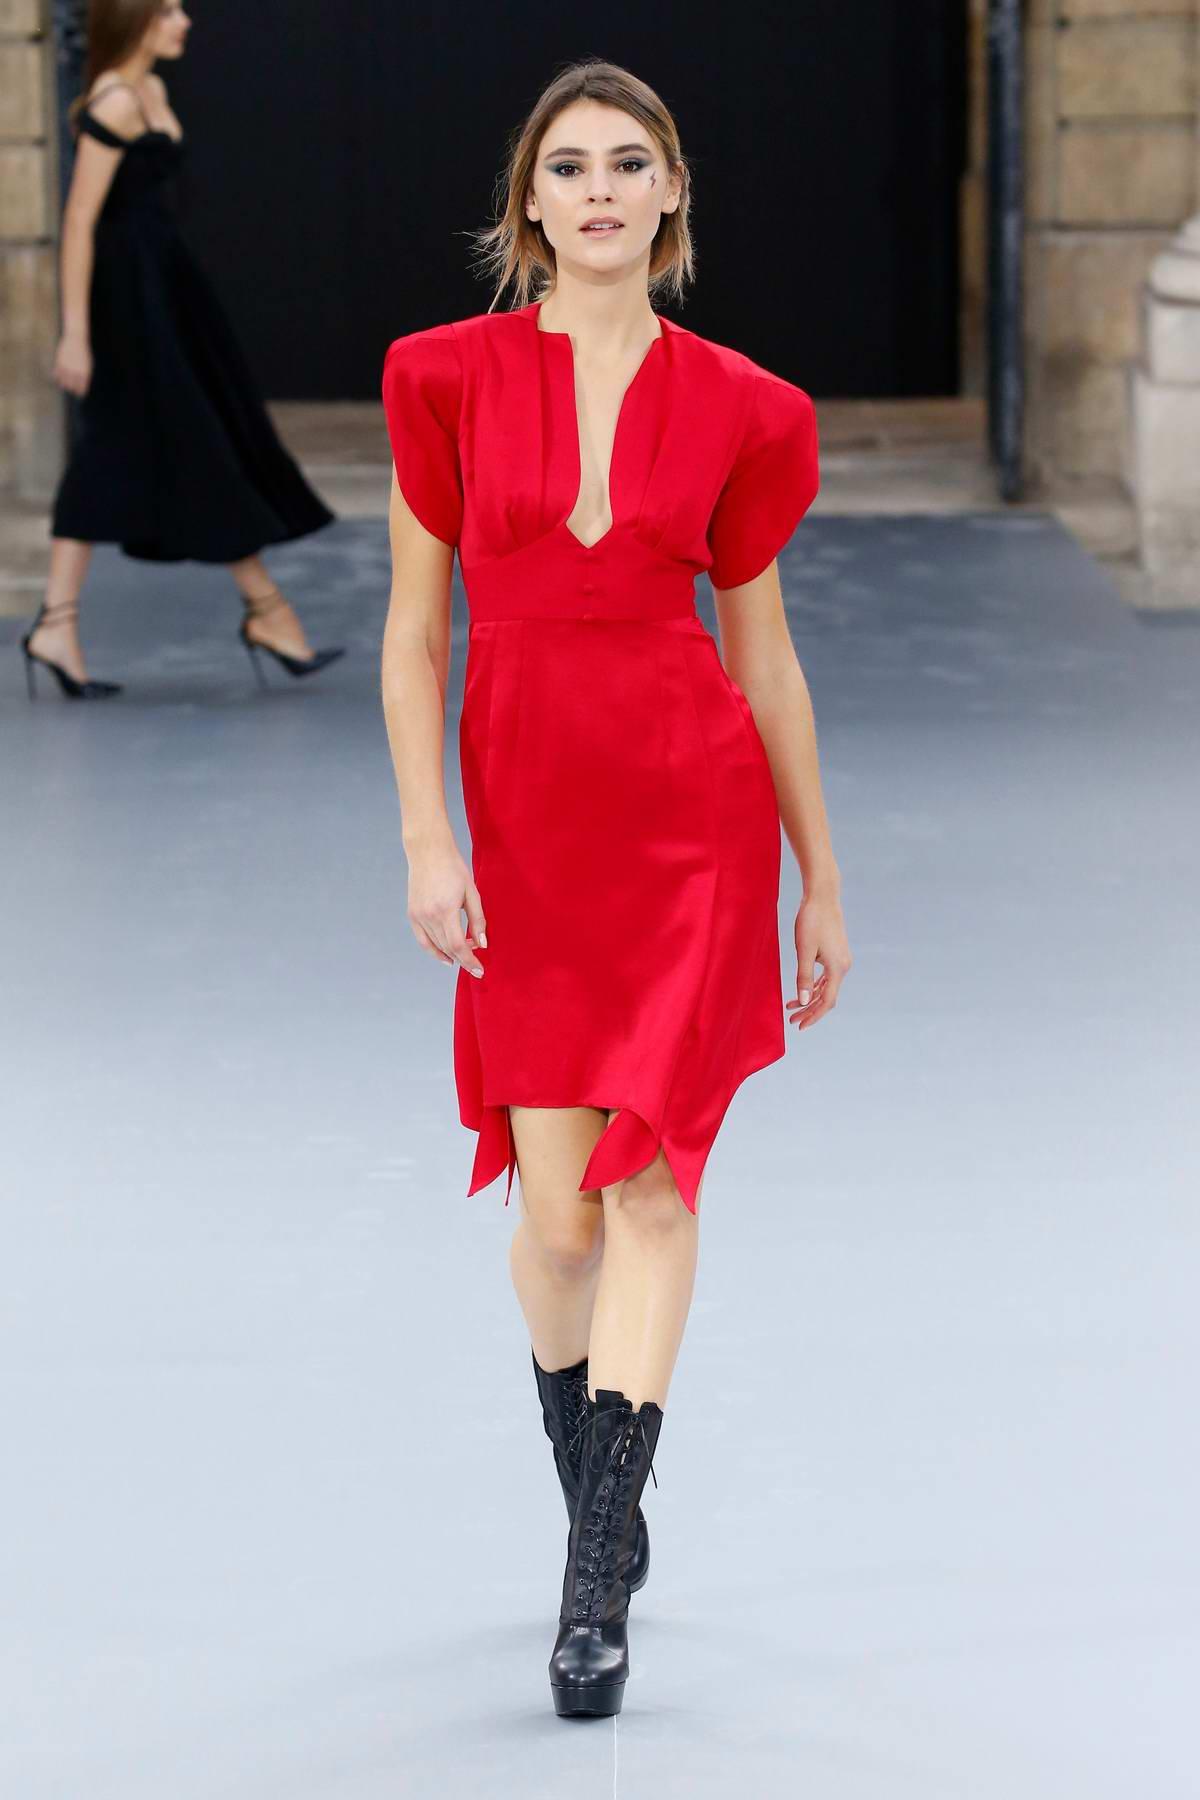 Stefanie Giesinger walks the runway at the L'Oreal Paris Spring/Summer 2020 show during Paris Fashion Week in Paris, France